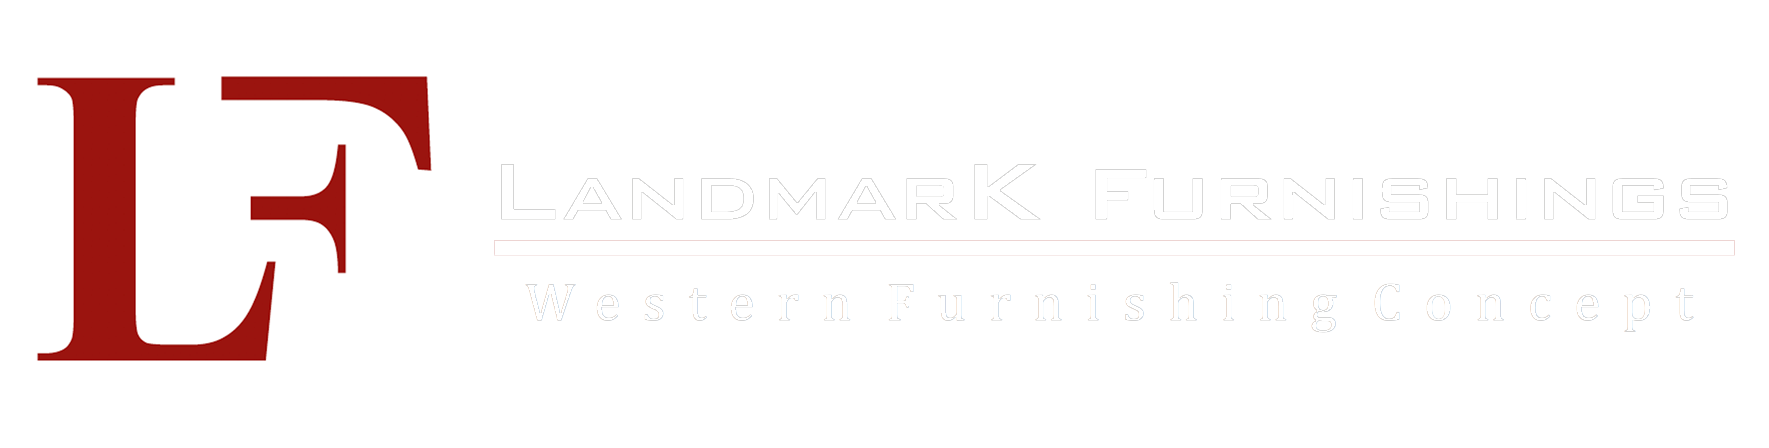 Landmark Furnishings